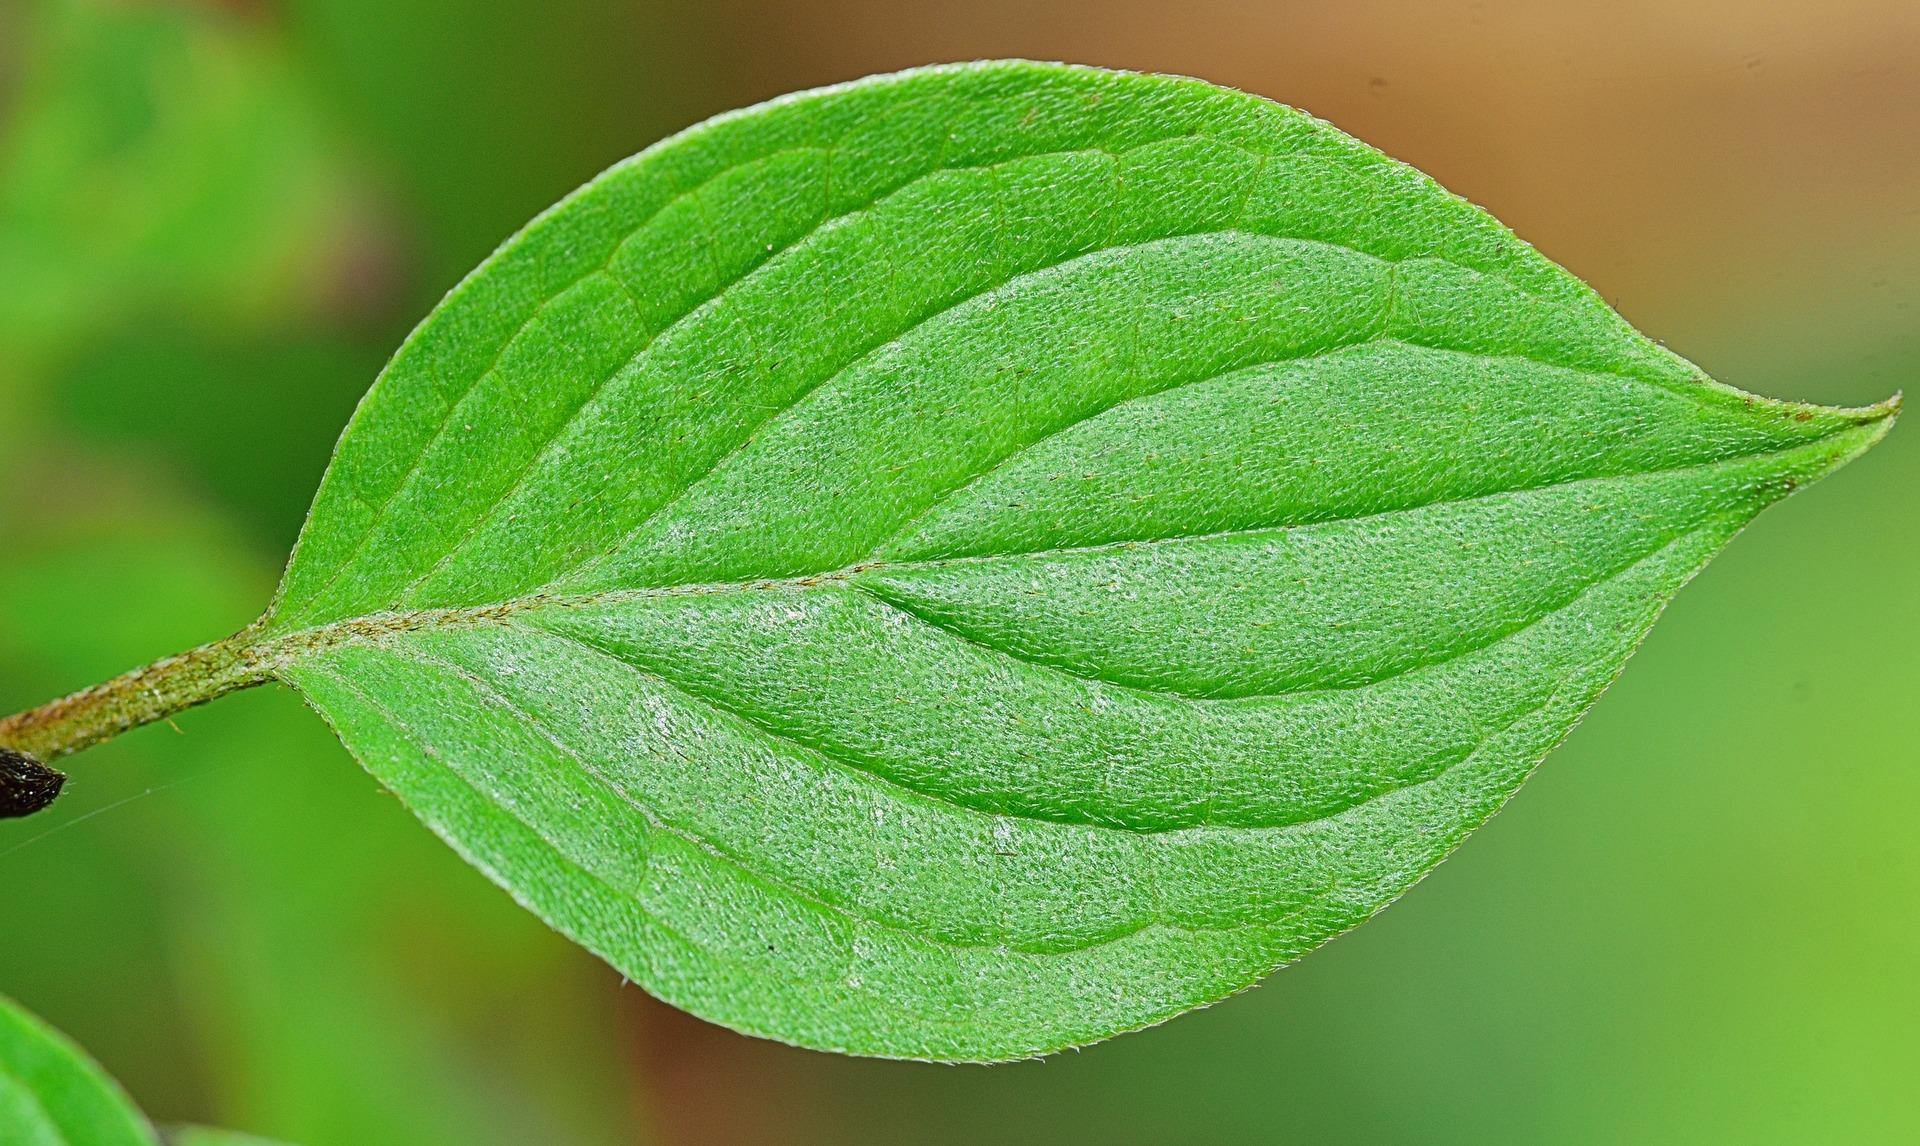 leaf-be-inspired.jpg